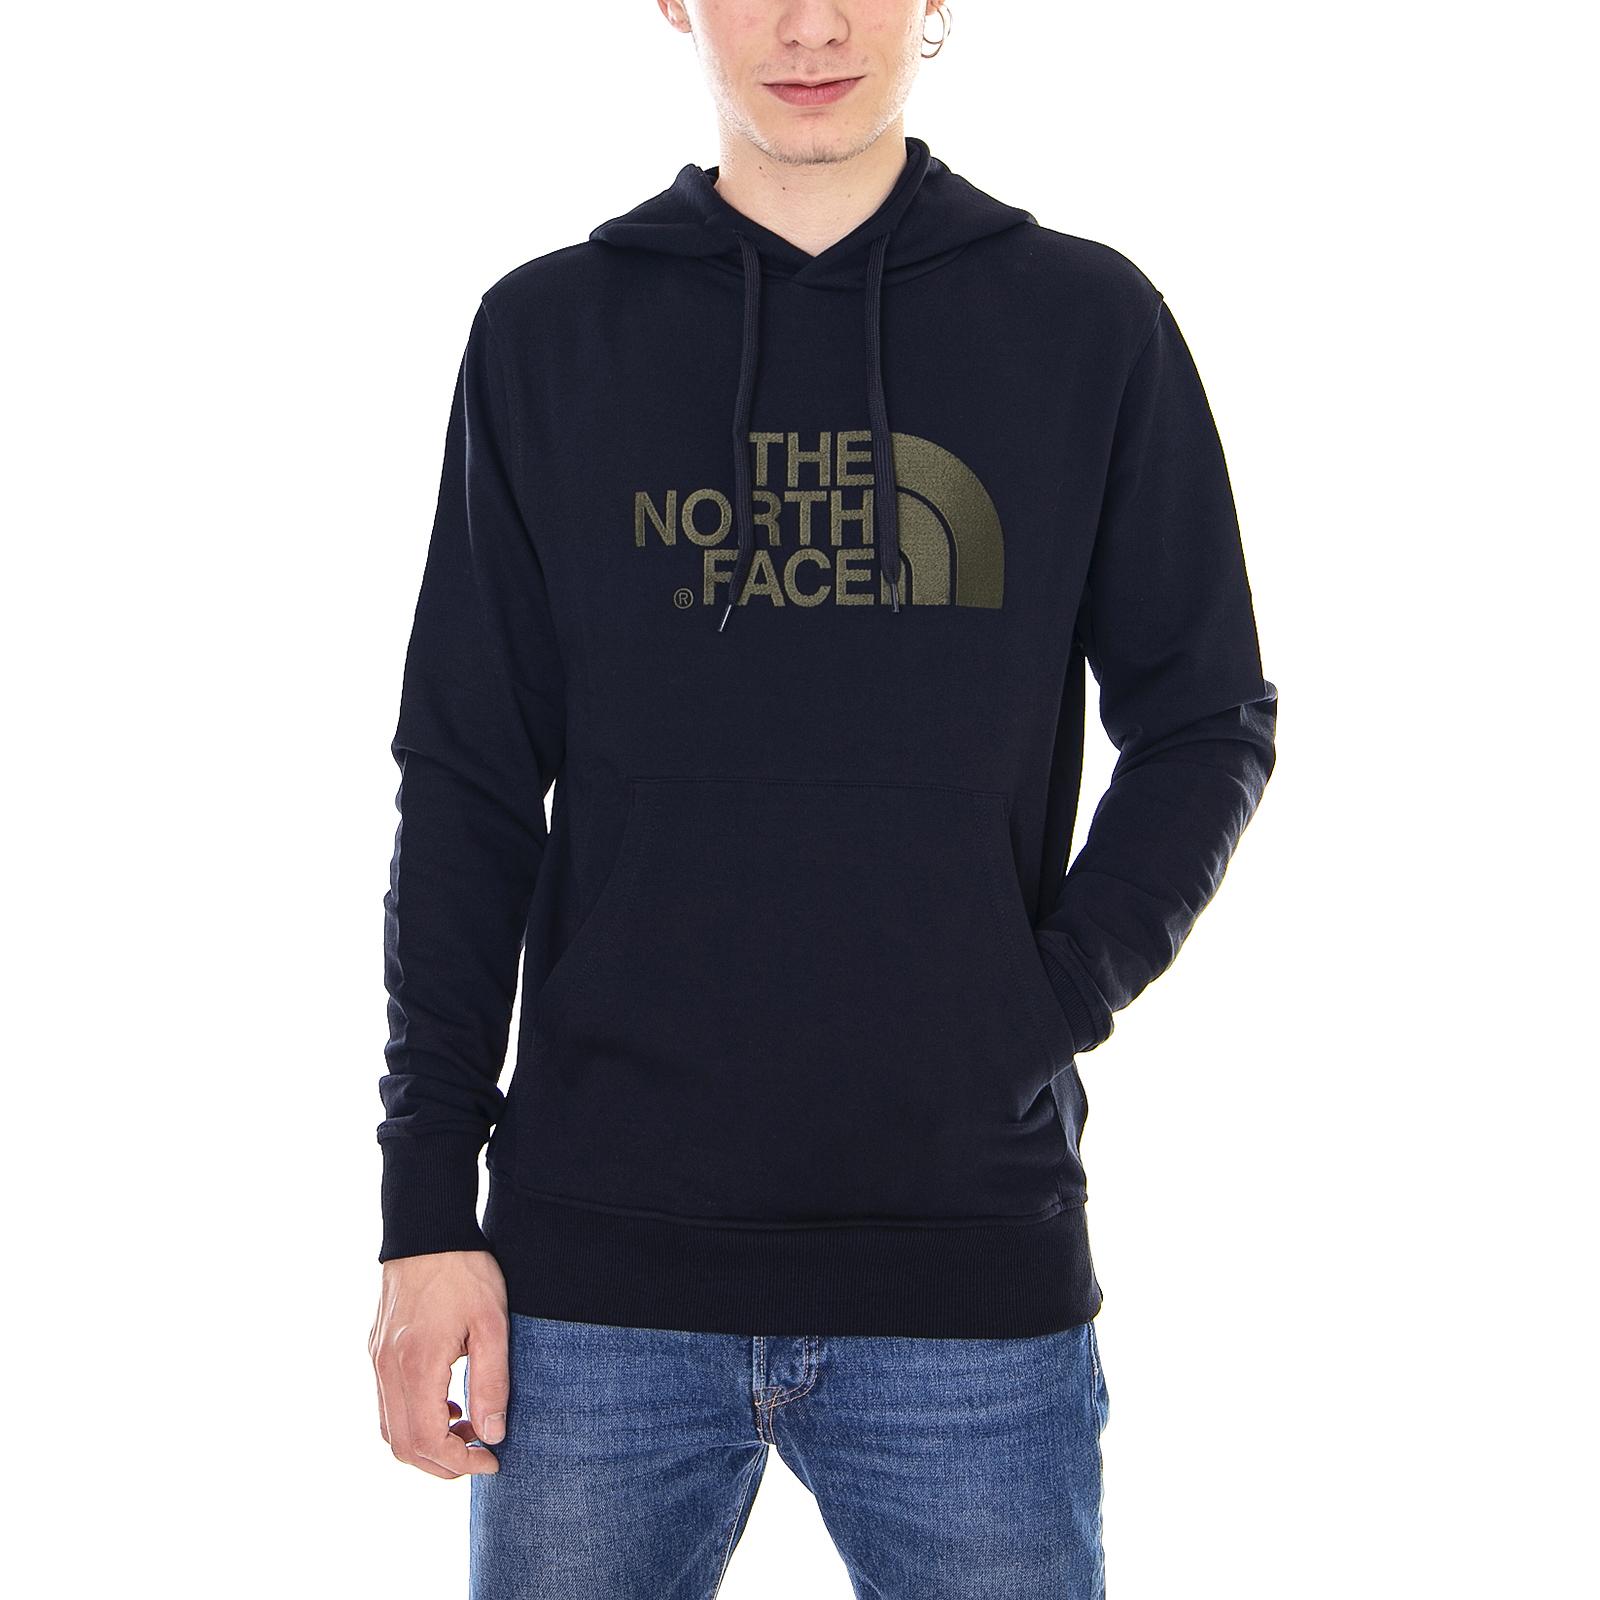 The North Face Felpe M Lt Drew Peak Po Hd Black/N.T.Green Nero